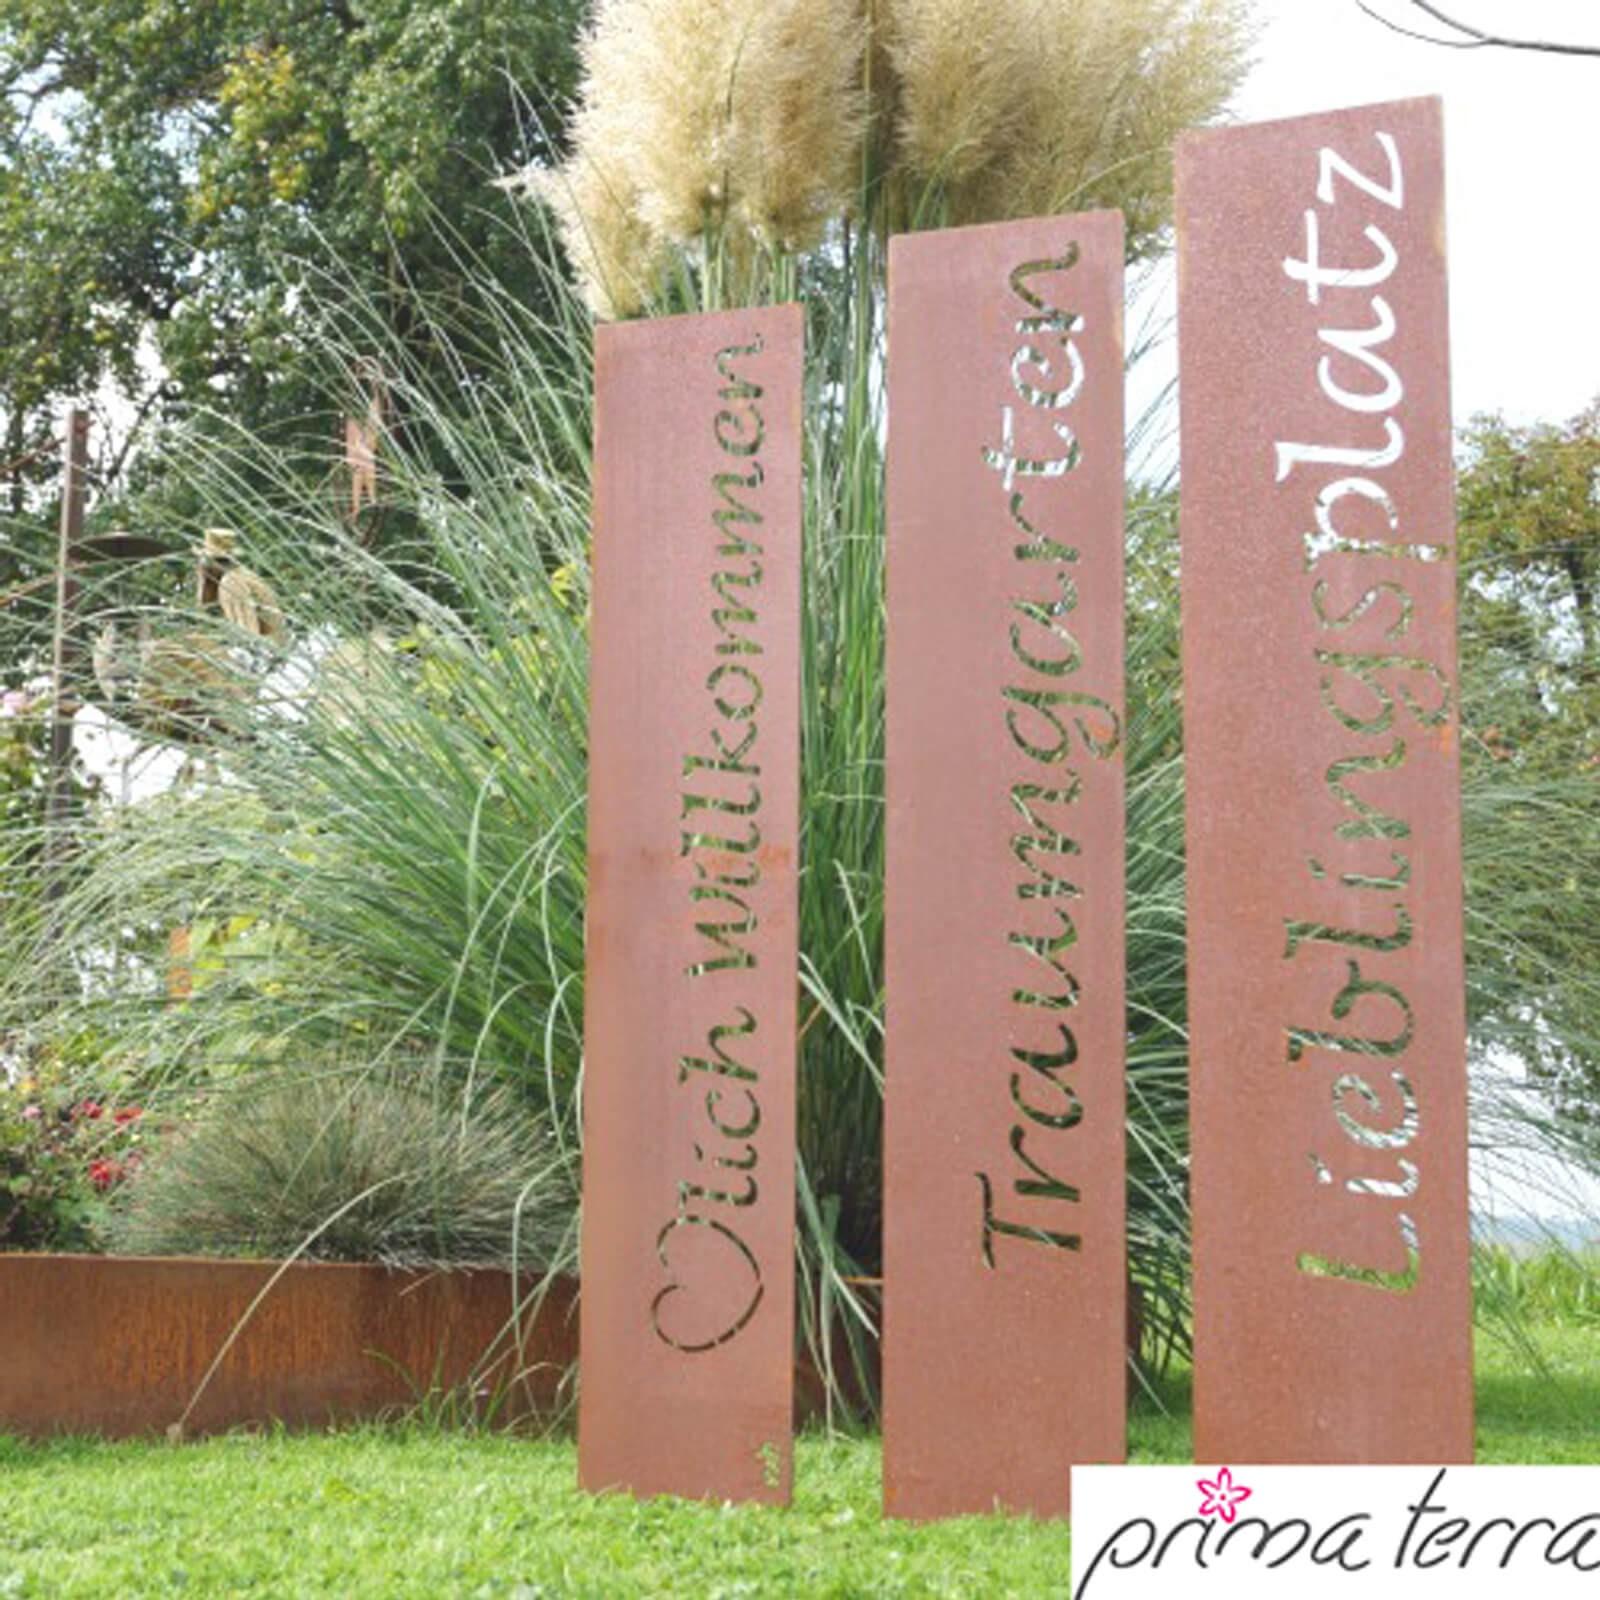 gartendekoration edelrost, prima terra edelrost gartendekoration green fingers, Design ideen